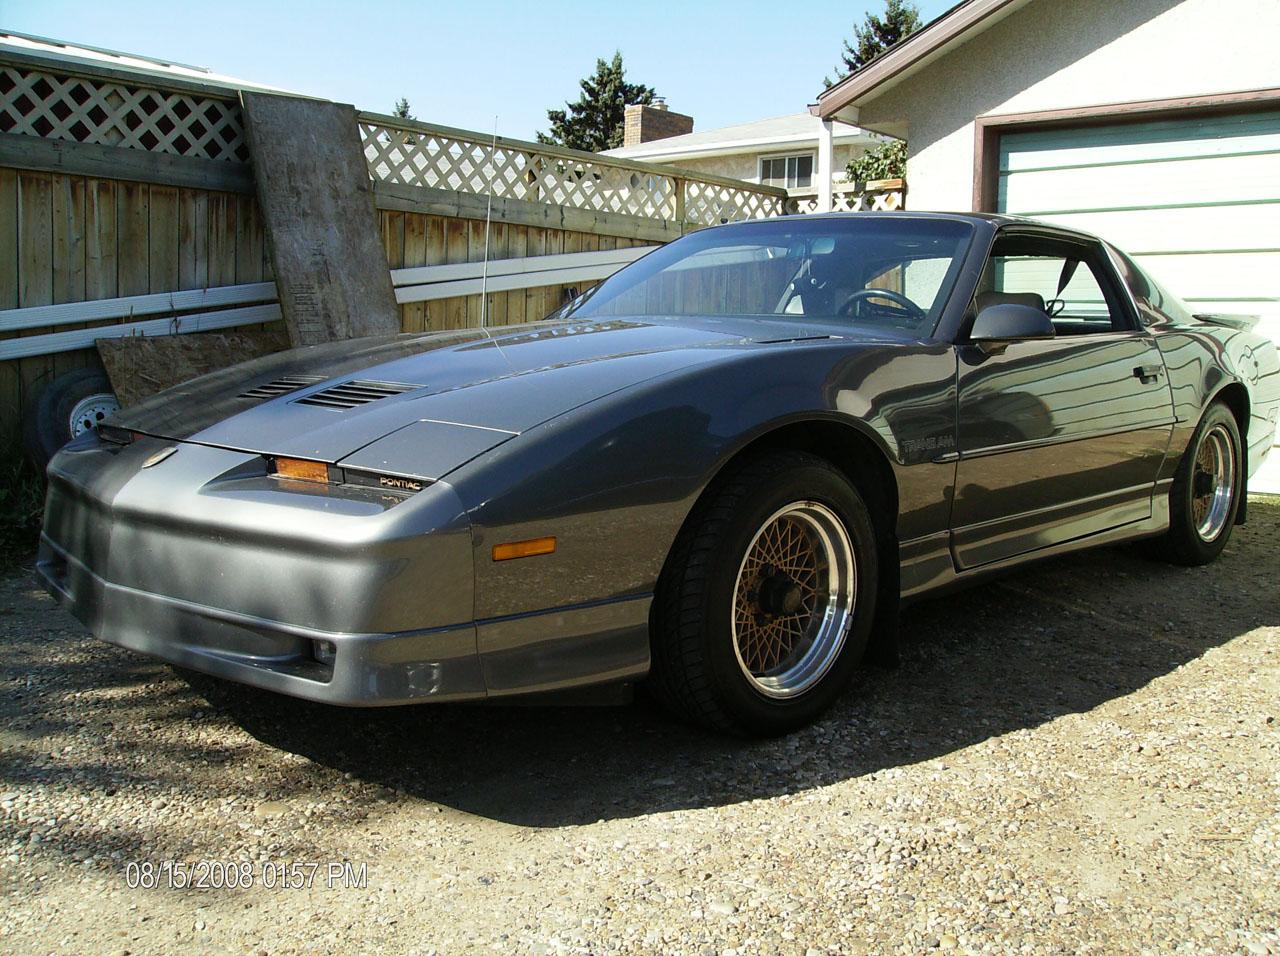 1989 Pontiac Trans Am gta 1/4 mile Drag Racing timeslip specs 0-60 ...